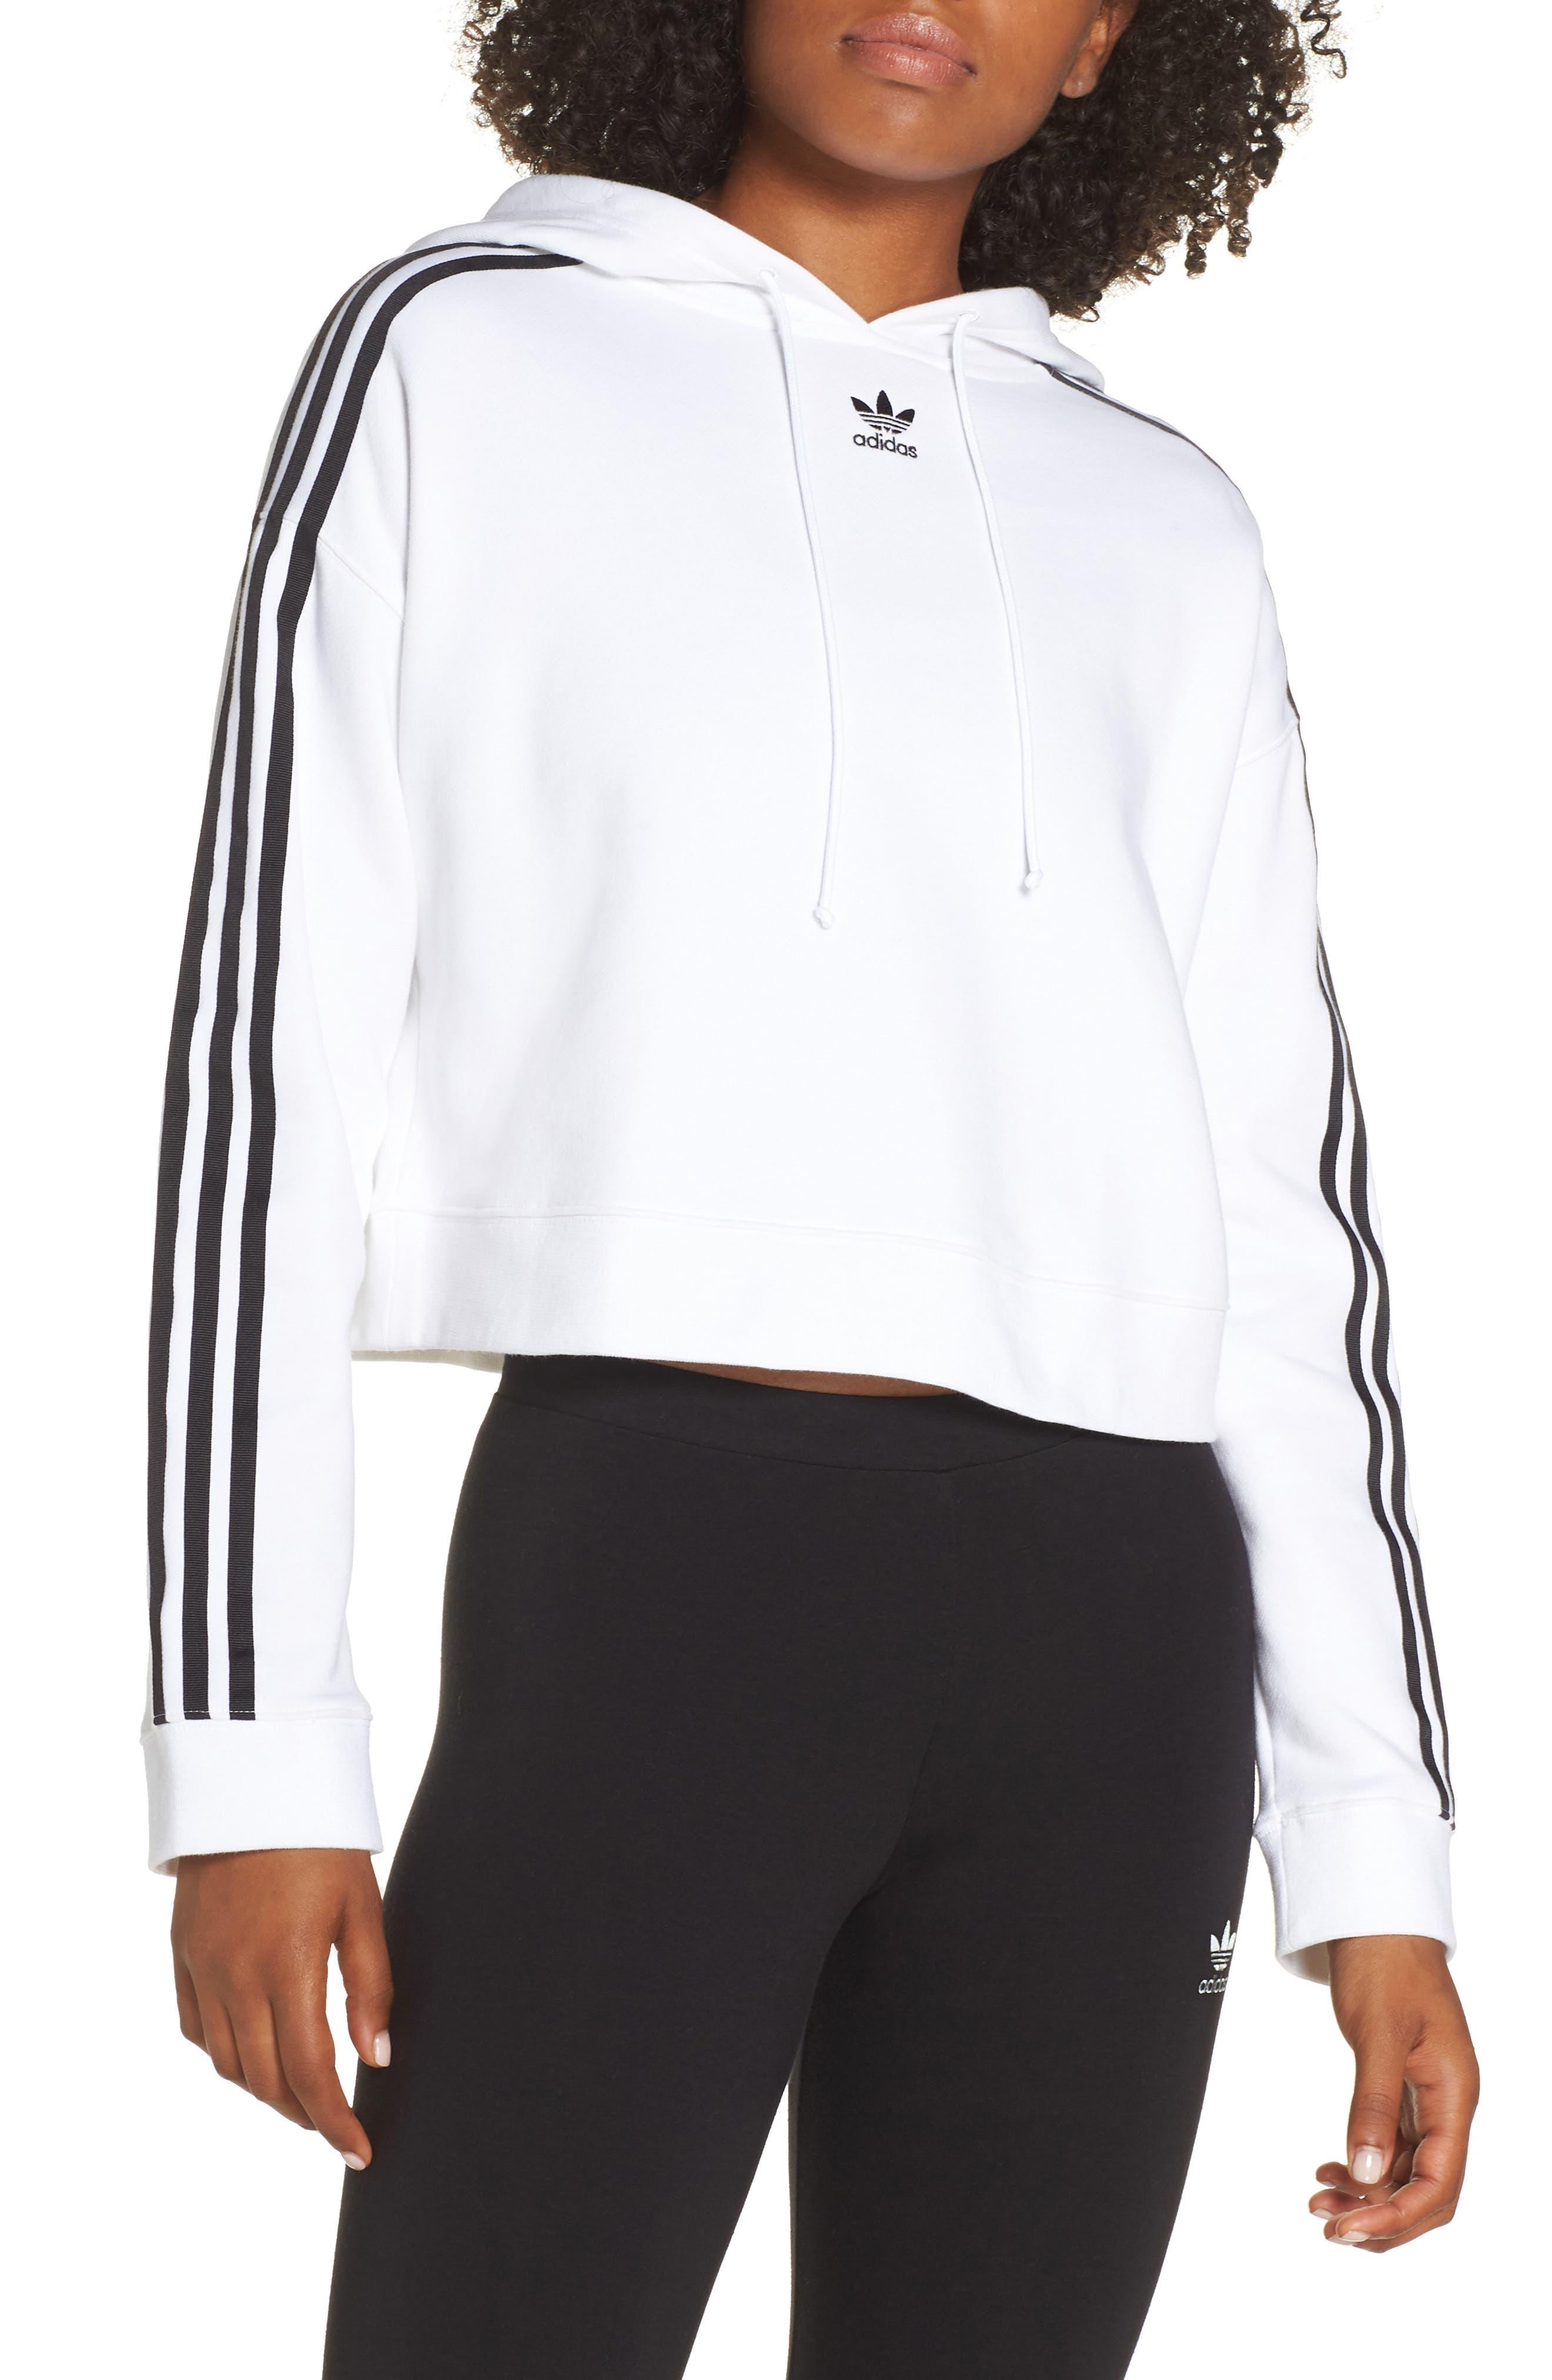 ADIDAS ORIGINALS Cropped Hoodie, Main, color, WHITE